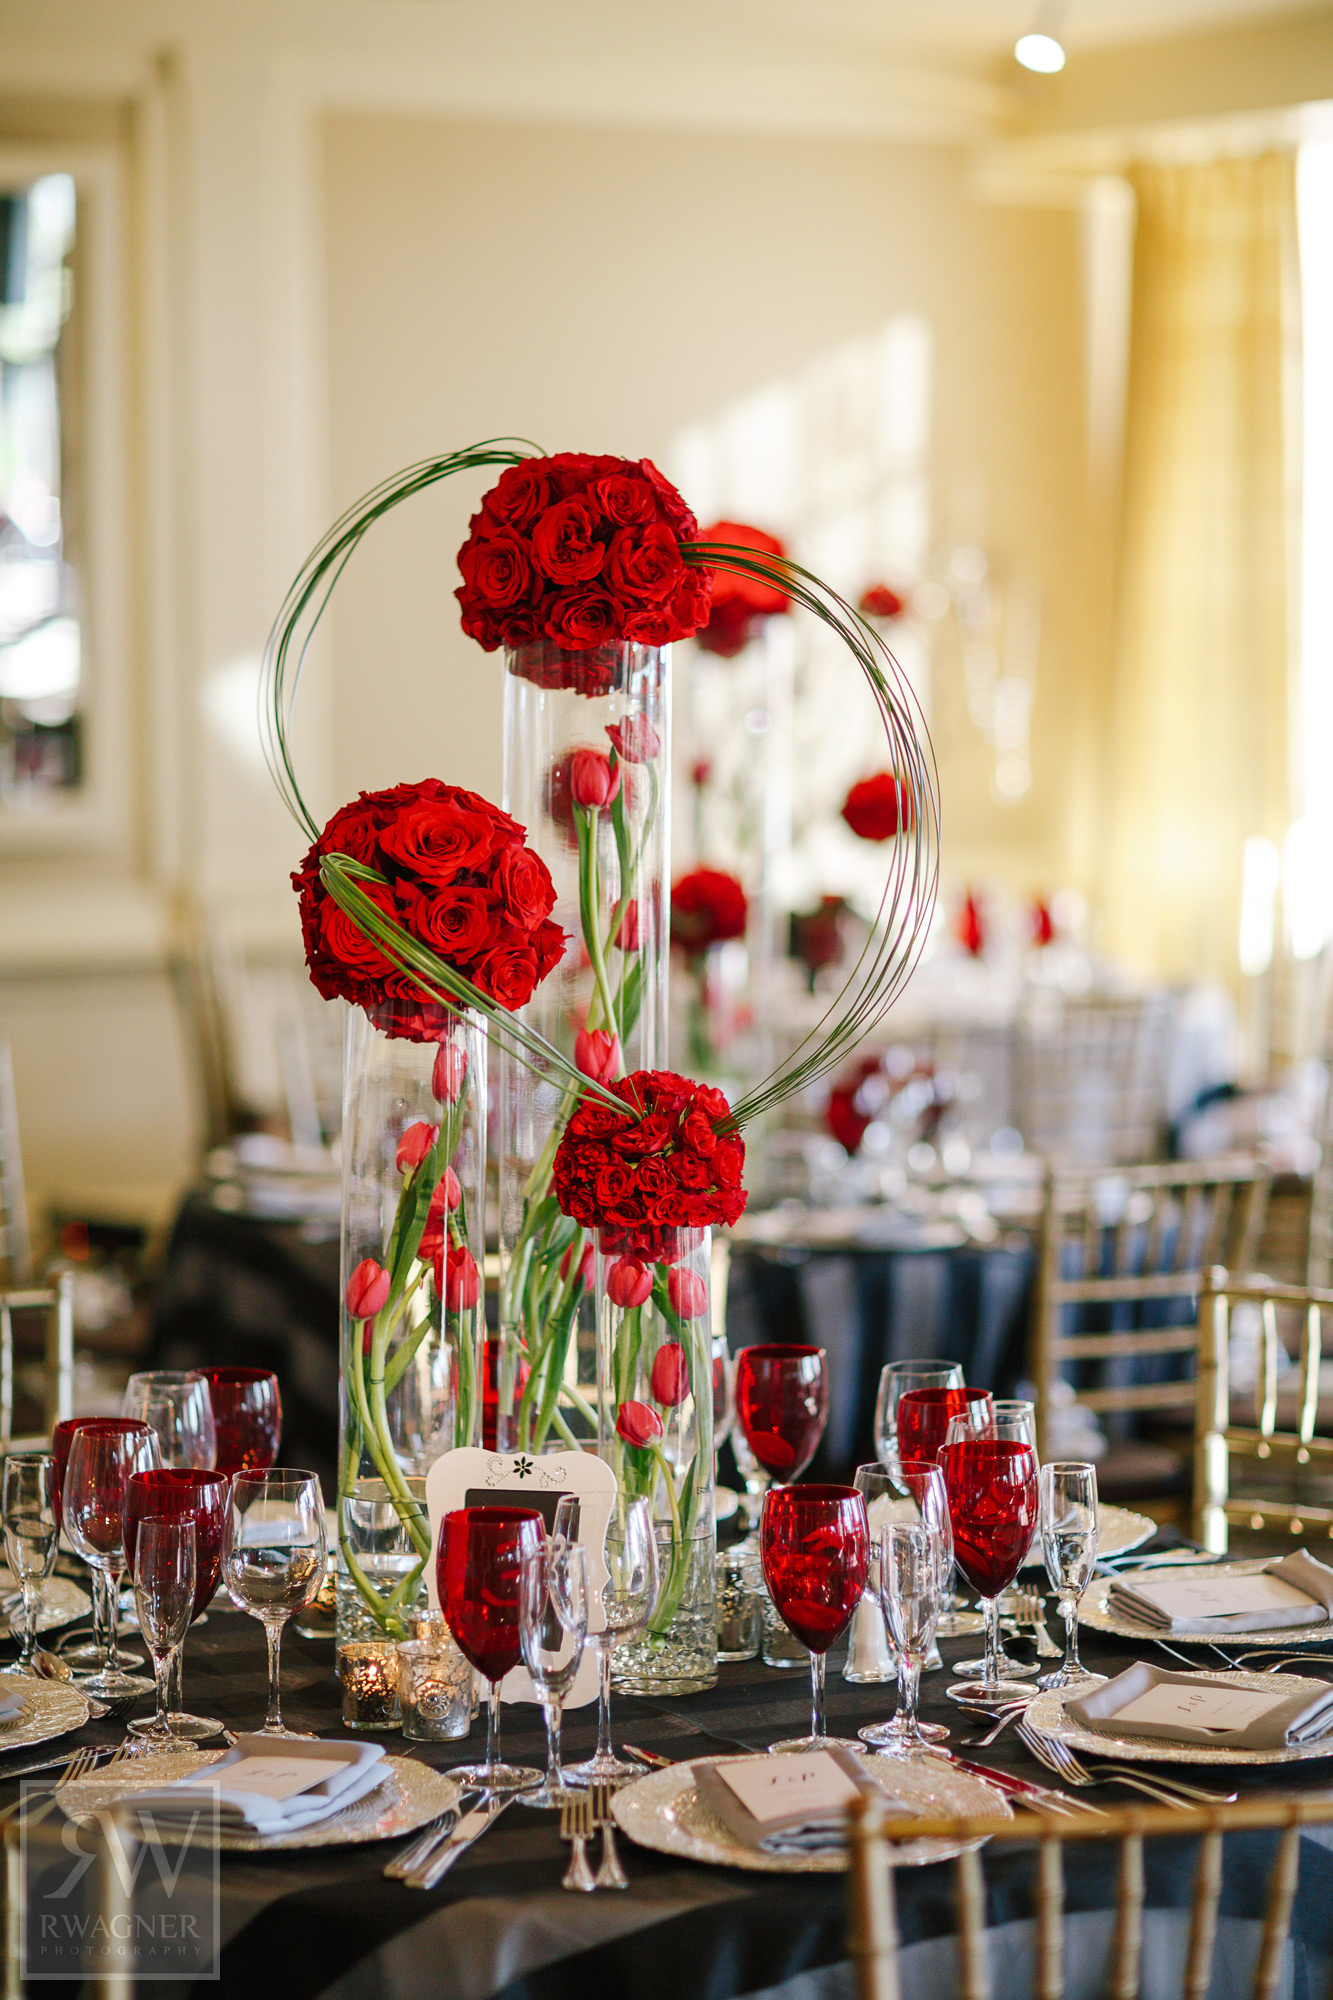 ceci_new_york_luxury_wedding_invitations_couture_red_black_white_real_wedding_dramatic_inn_at_longshore_v286_20.jpg